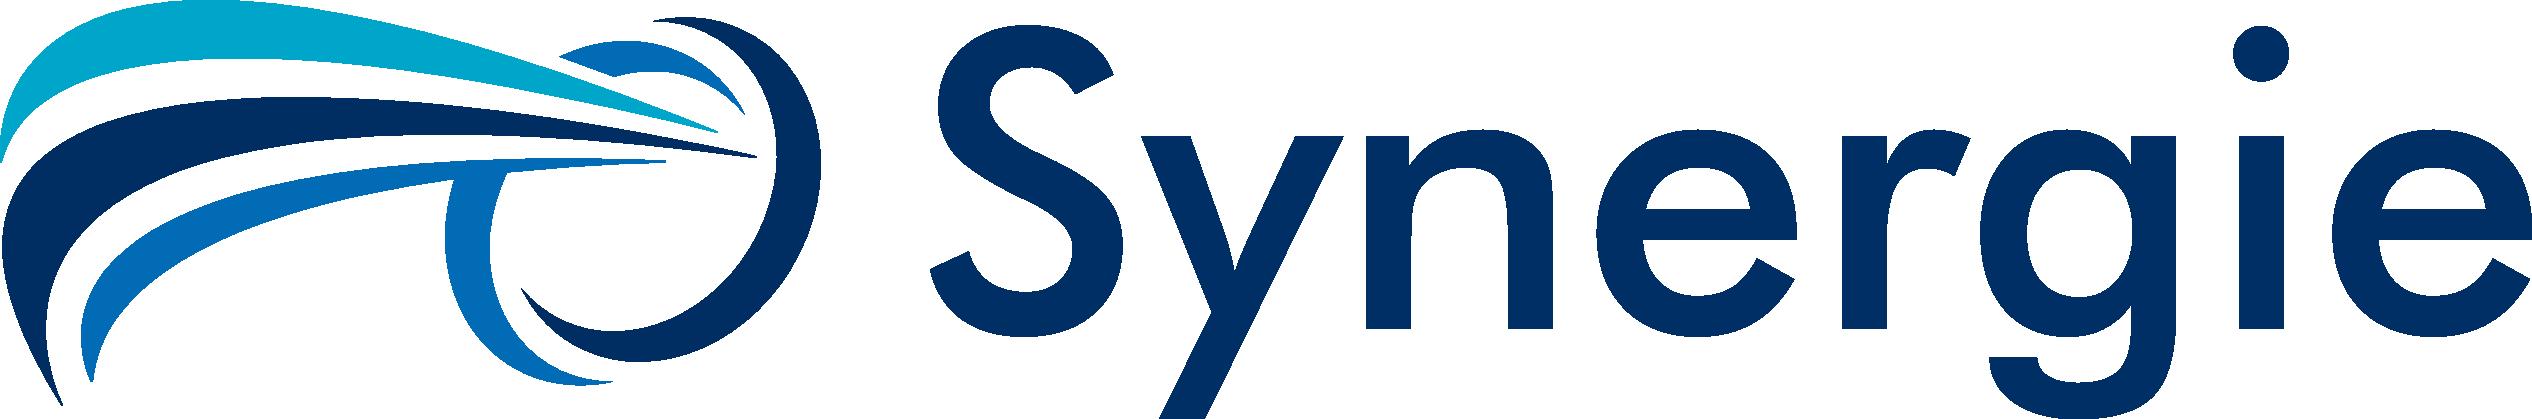 Synergie Inkasso GmbH